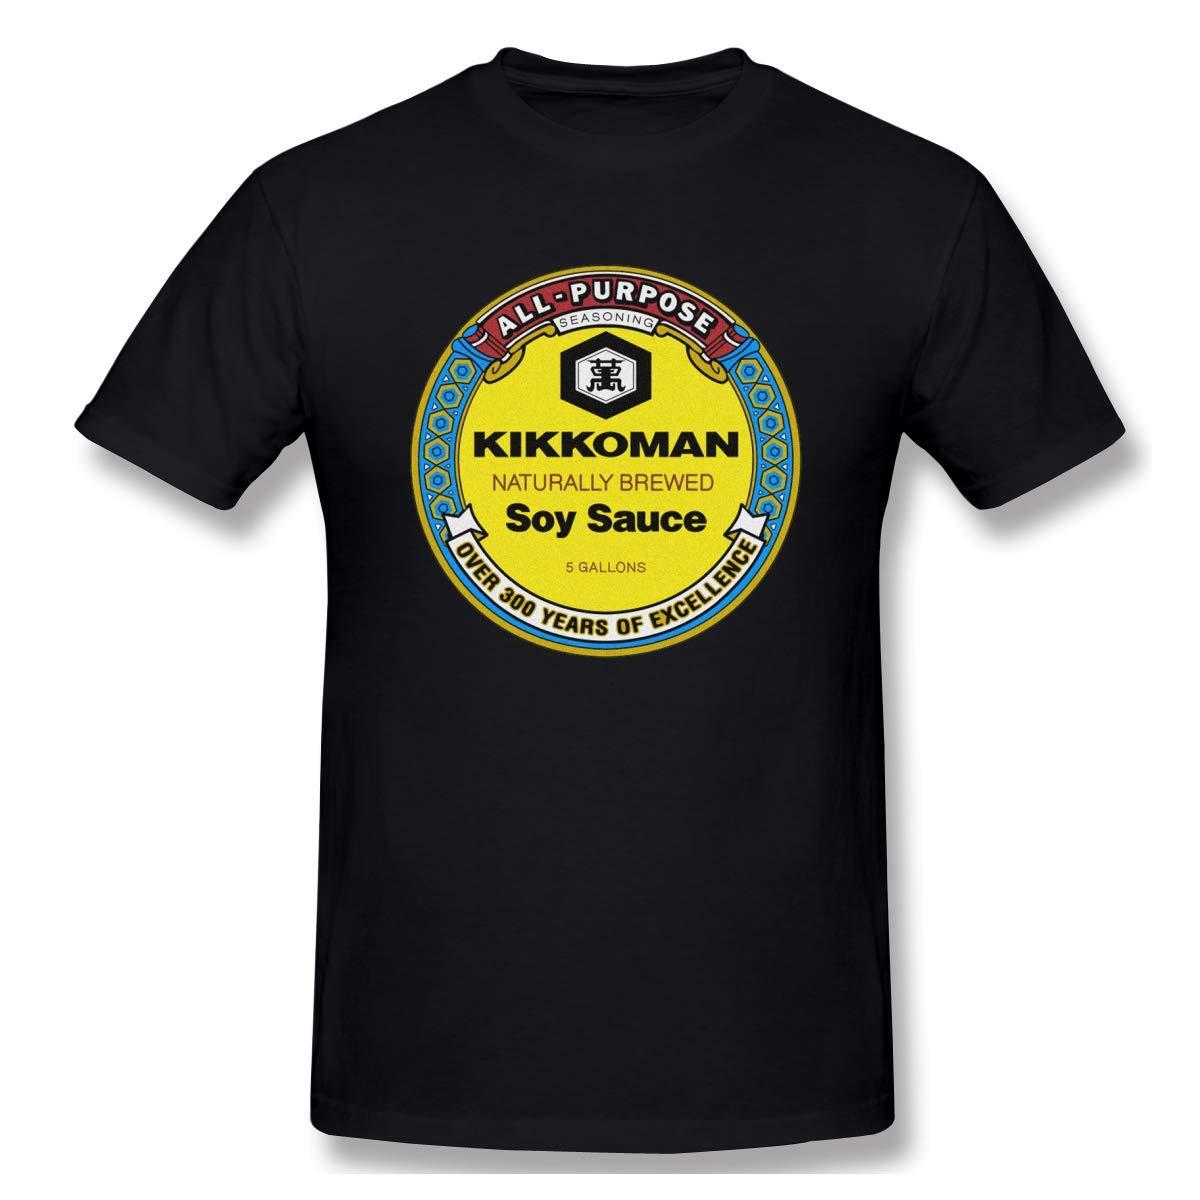 All-Purpose-Kikkoman-Soy-Sauce T-Shirt Unisesx Men Women Youth Cotton Tee